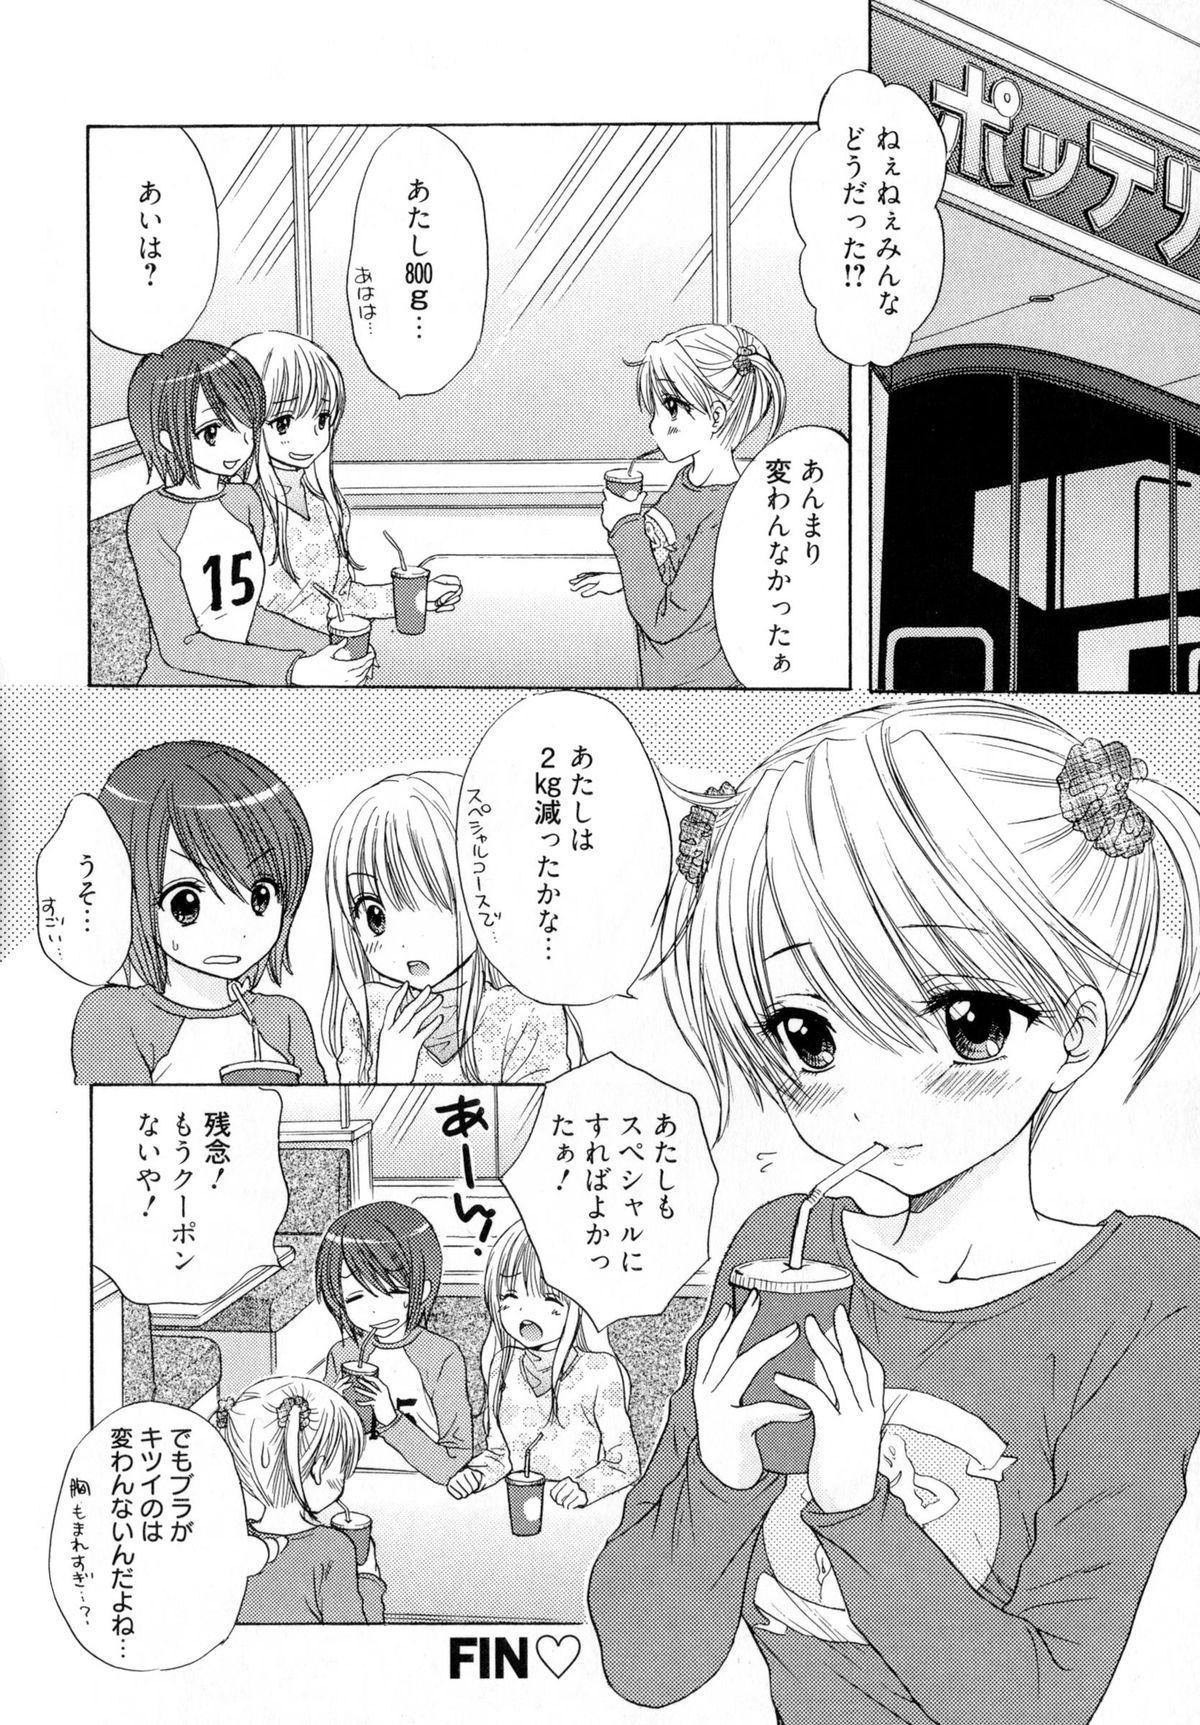 The Great Escape 4 Shokai Genteiban 53